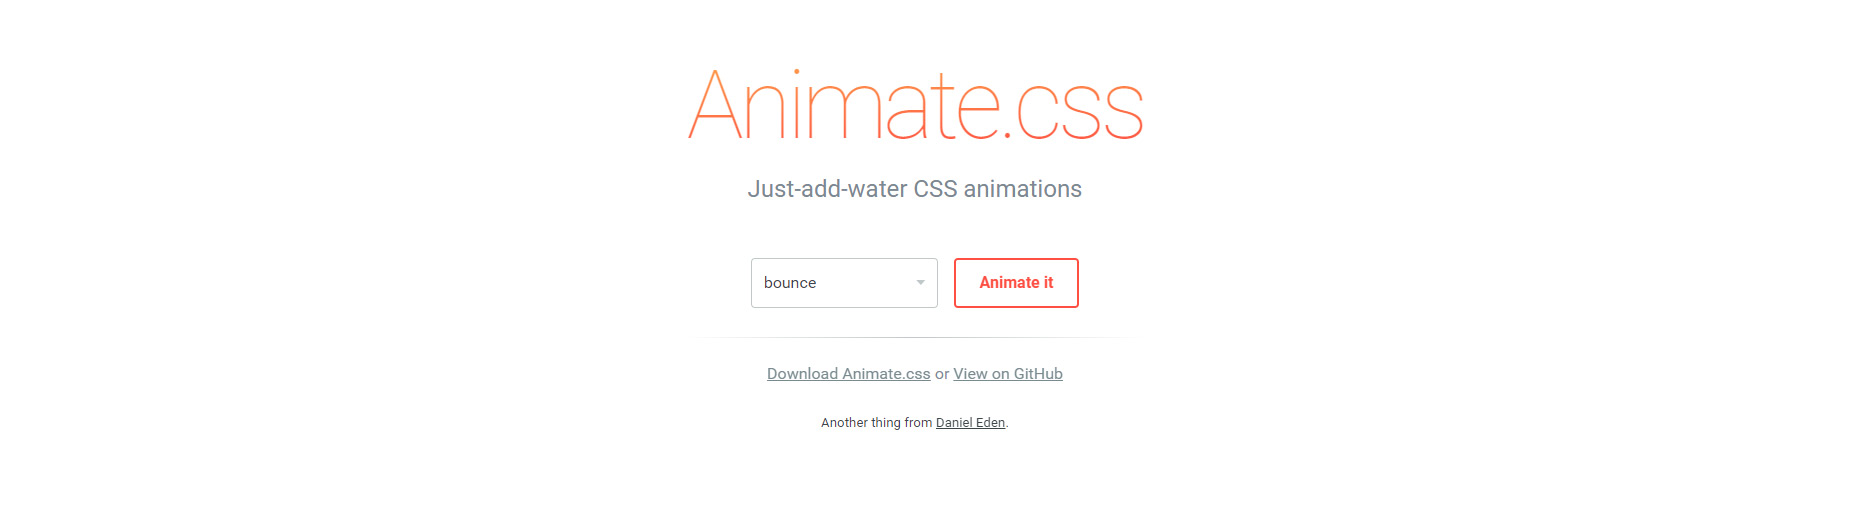 04-animace-css